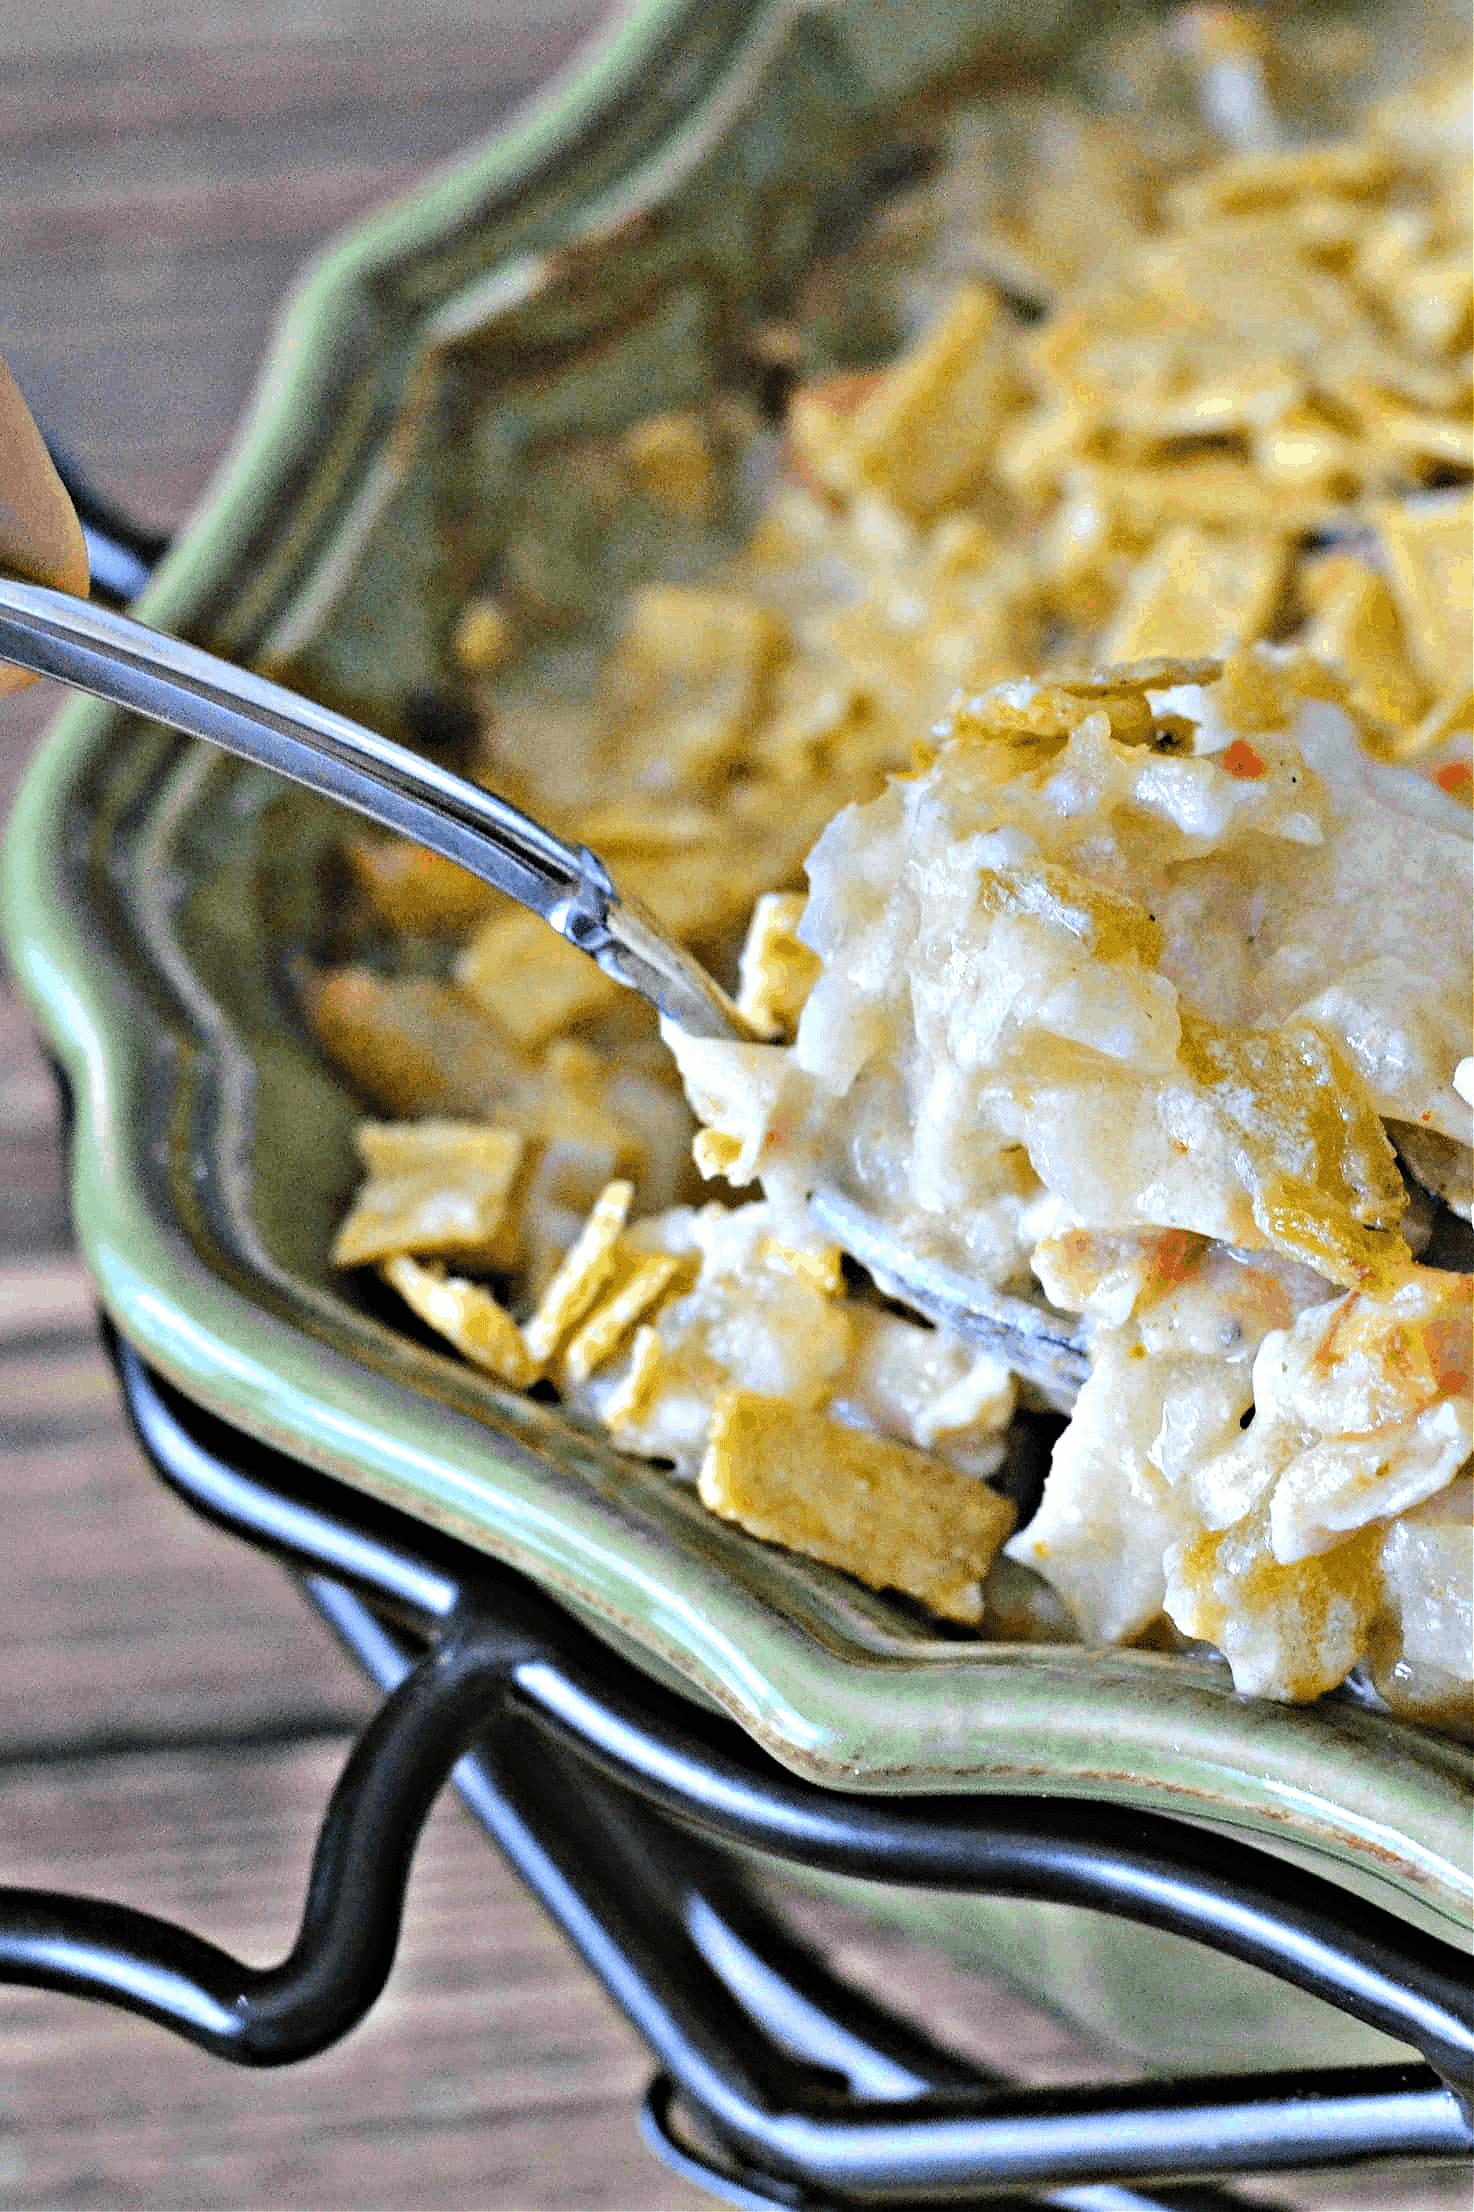 chicken and potatoes casserole in a casserole dish